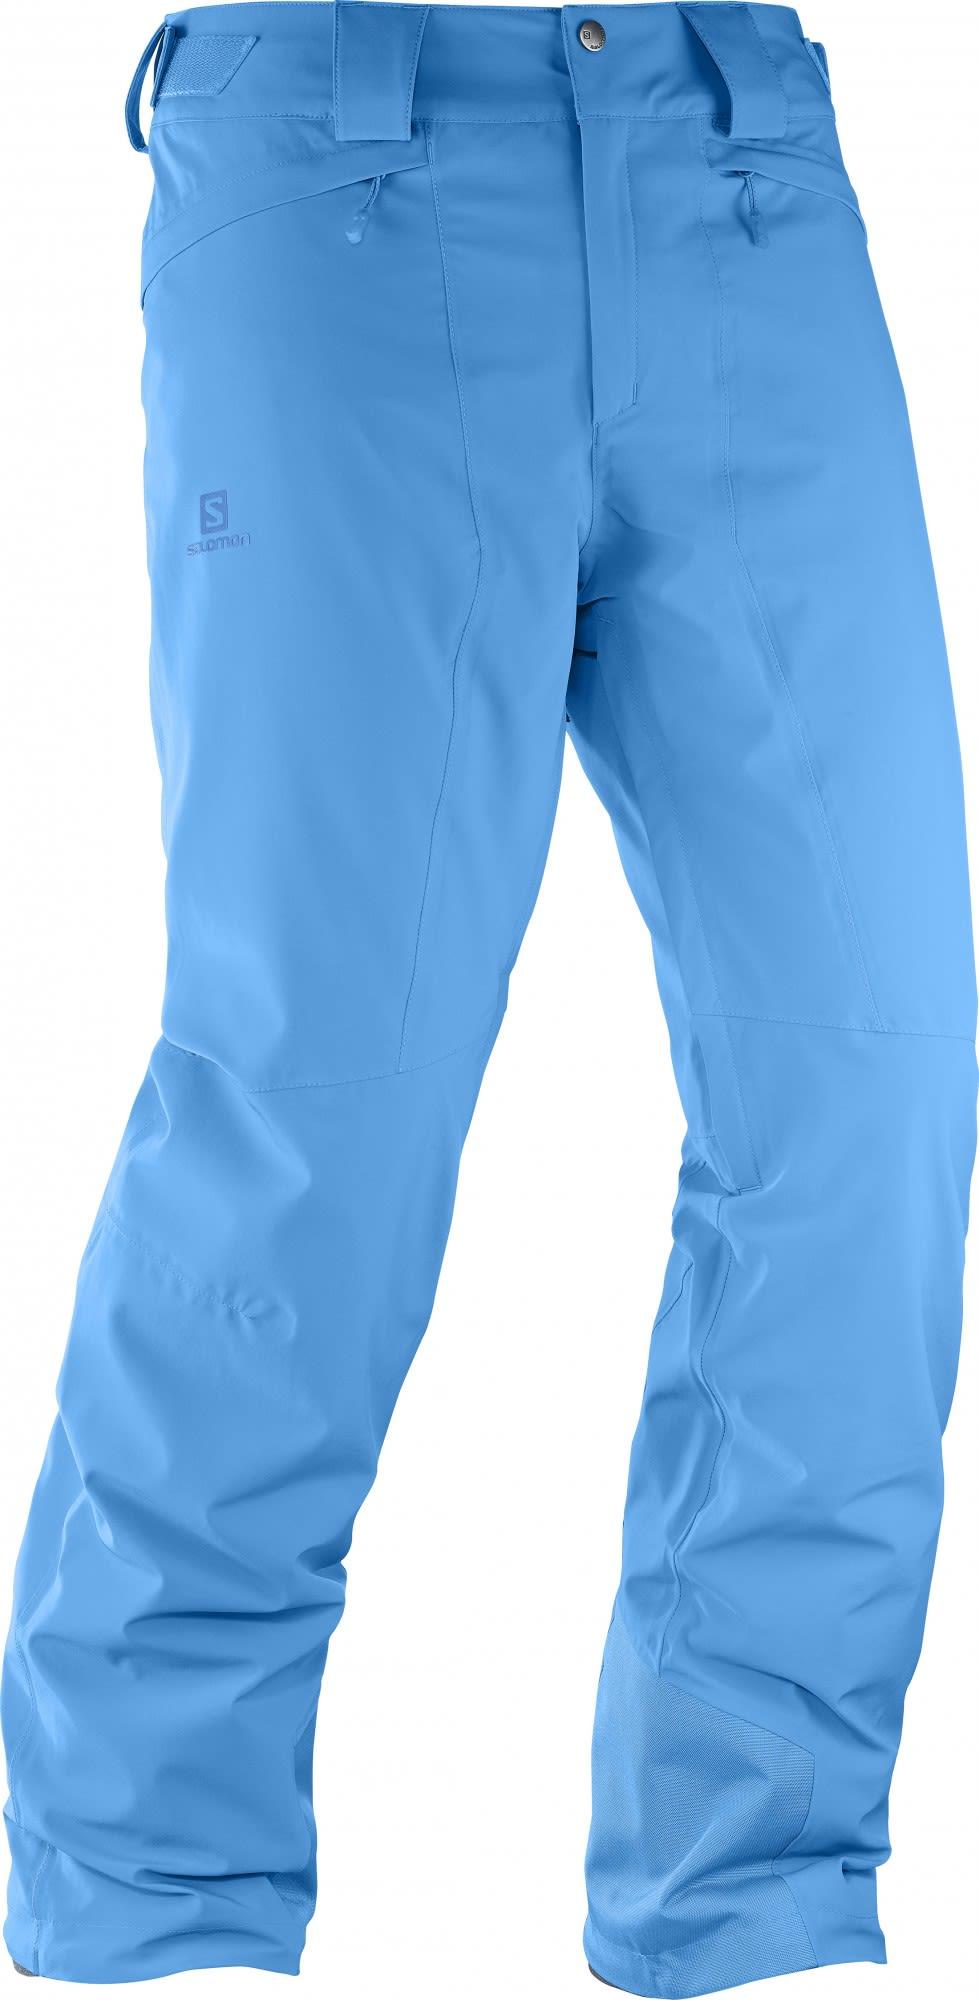 Salomon Icemania Pant (Modell Winter 2017) Blau, Male Hose, S/R